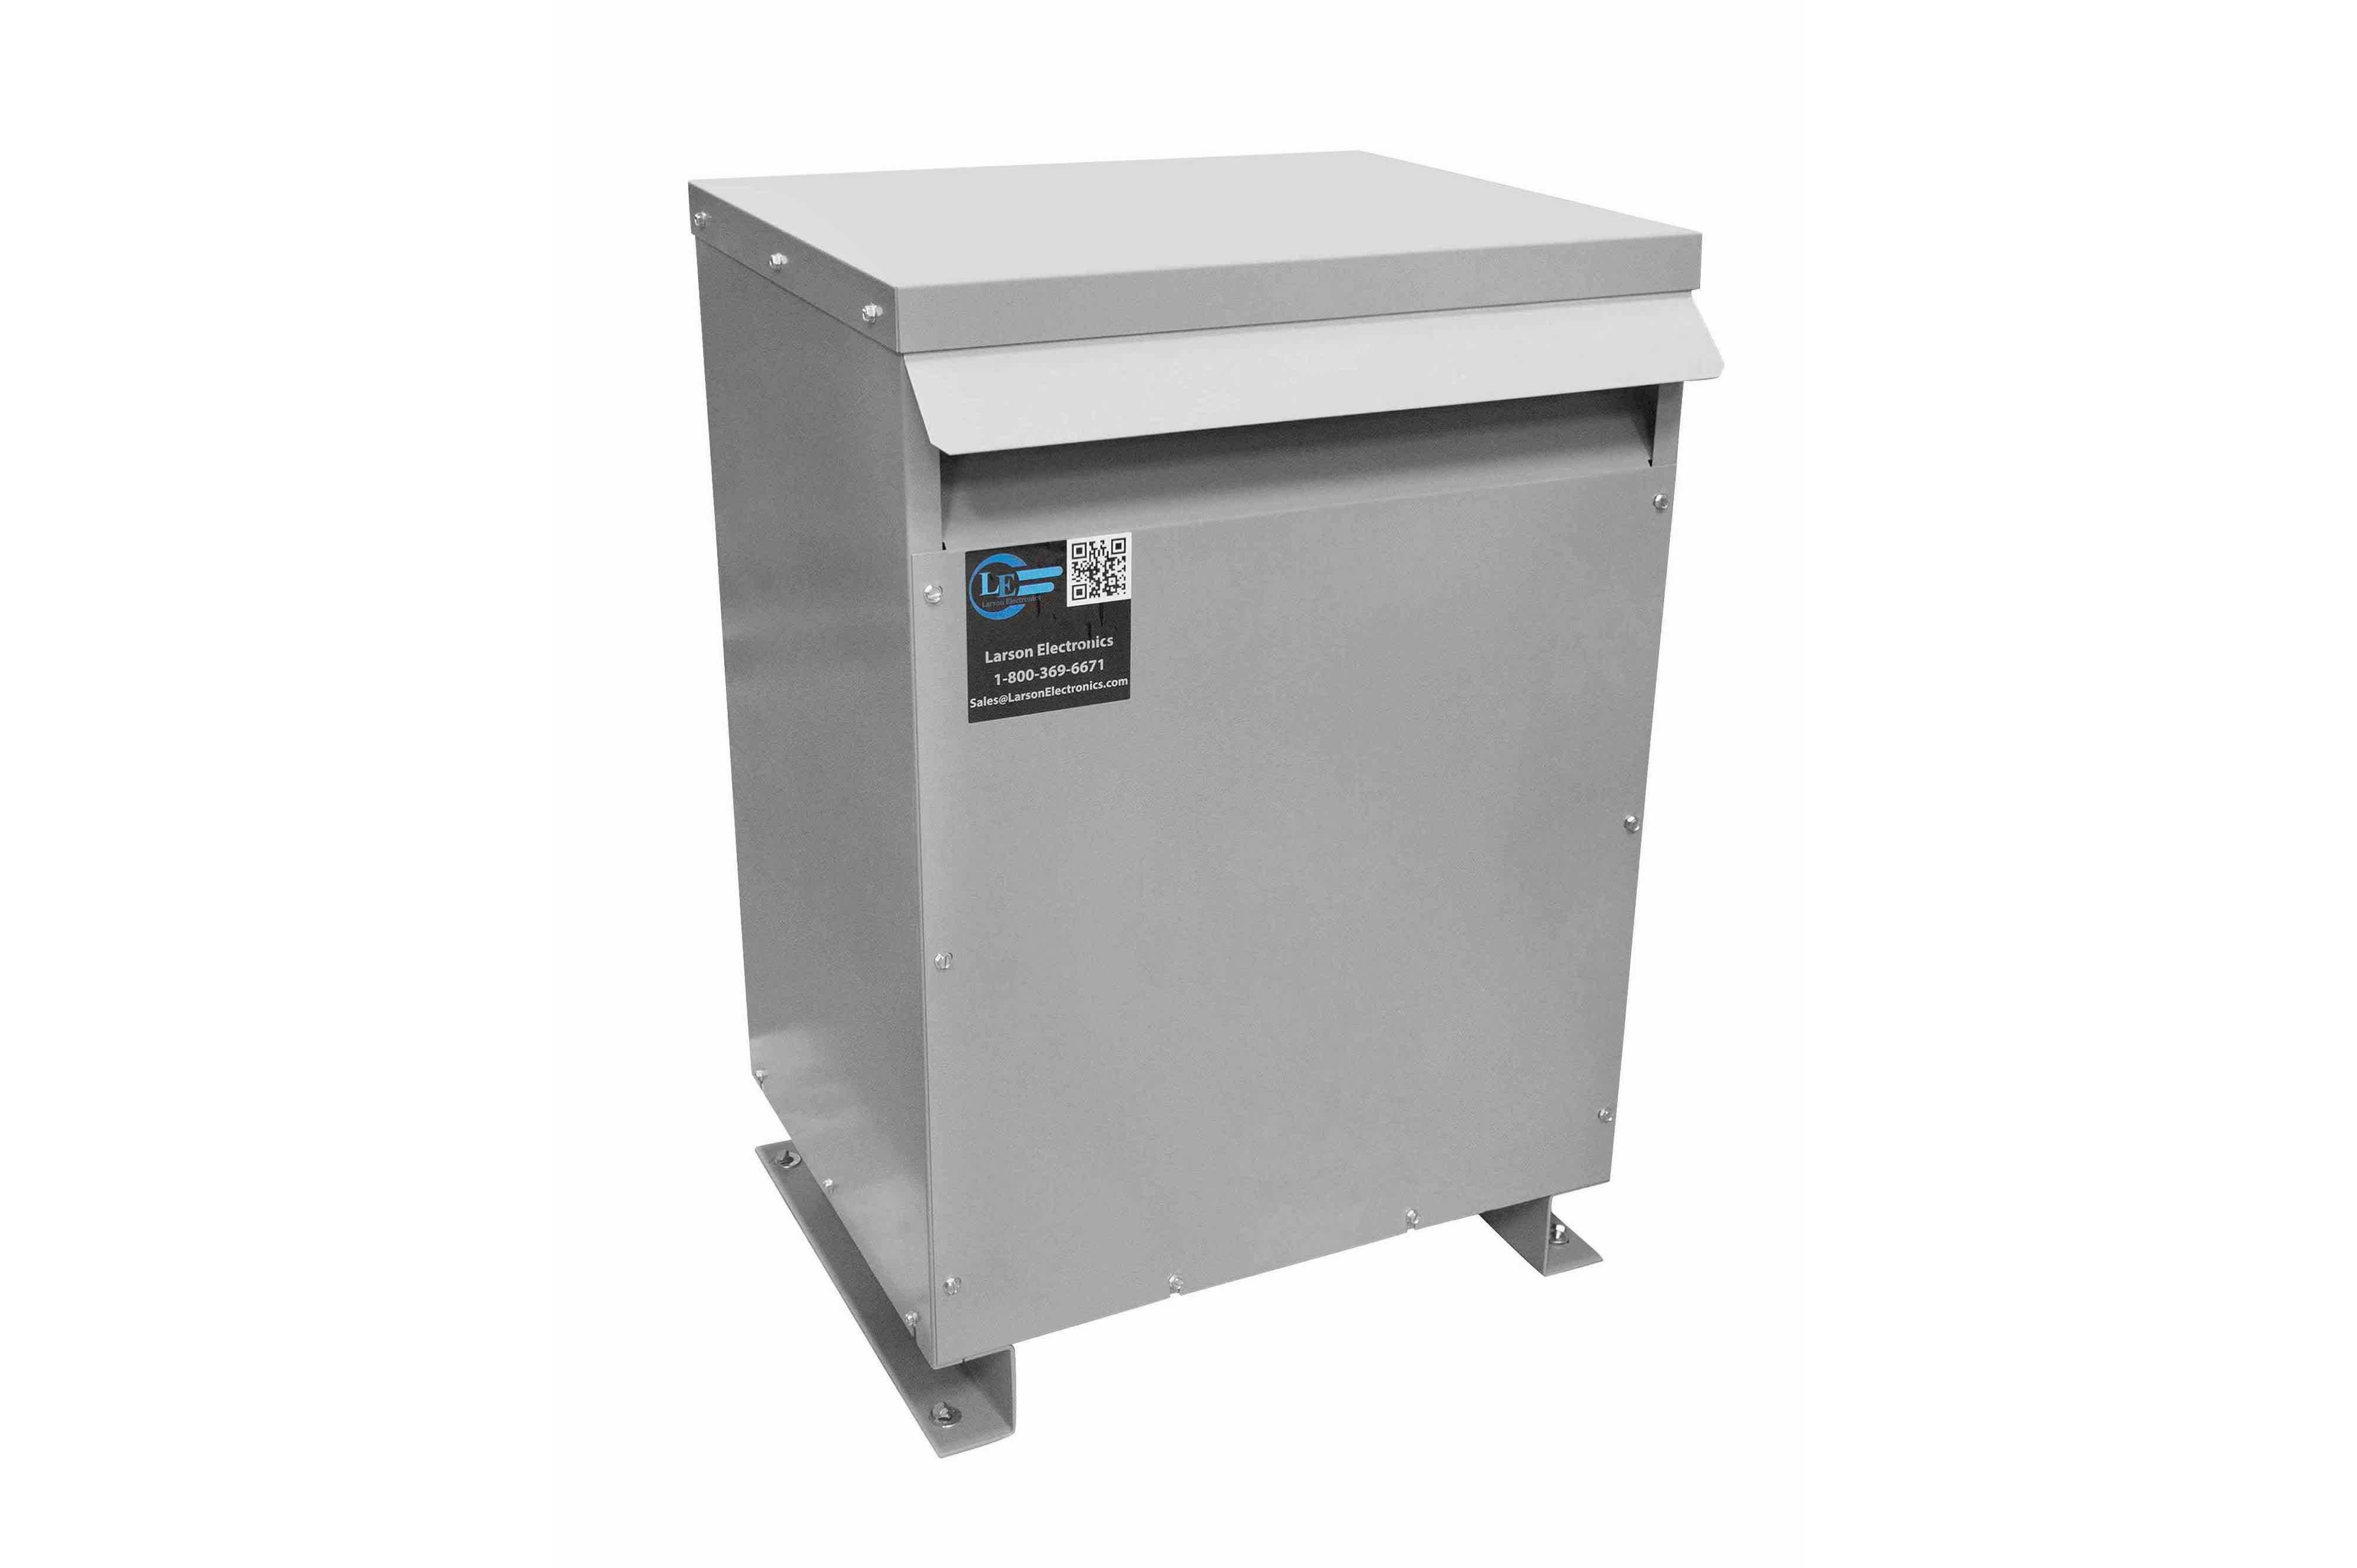 65 kVA 3PH Isolation Transformer, 600V Wye Primary, 400Y/231 Wye-N Secondary, N3R, Ventilated, 60 Hz